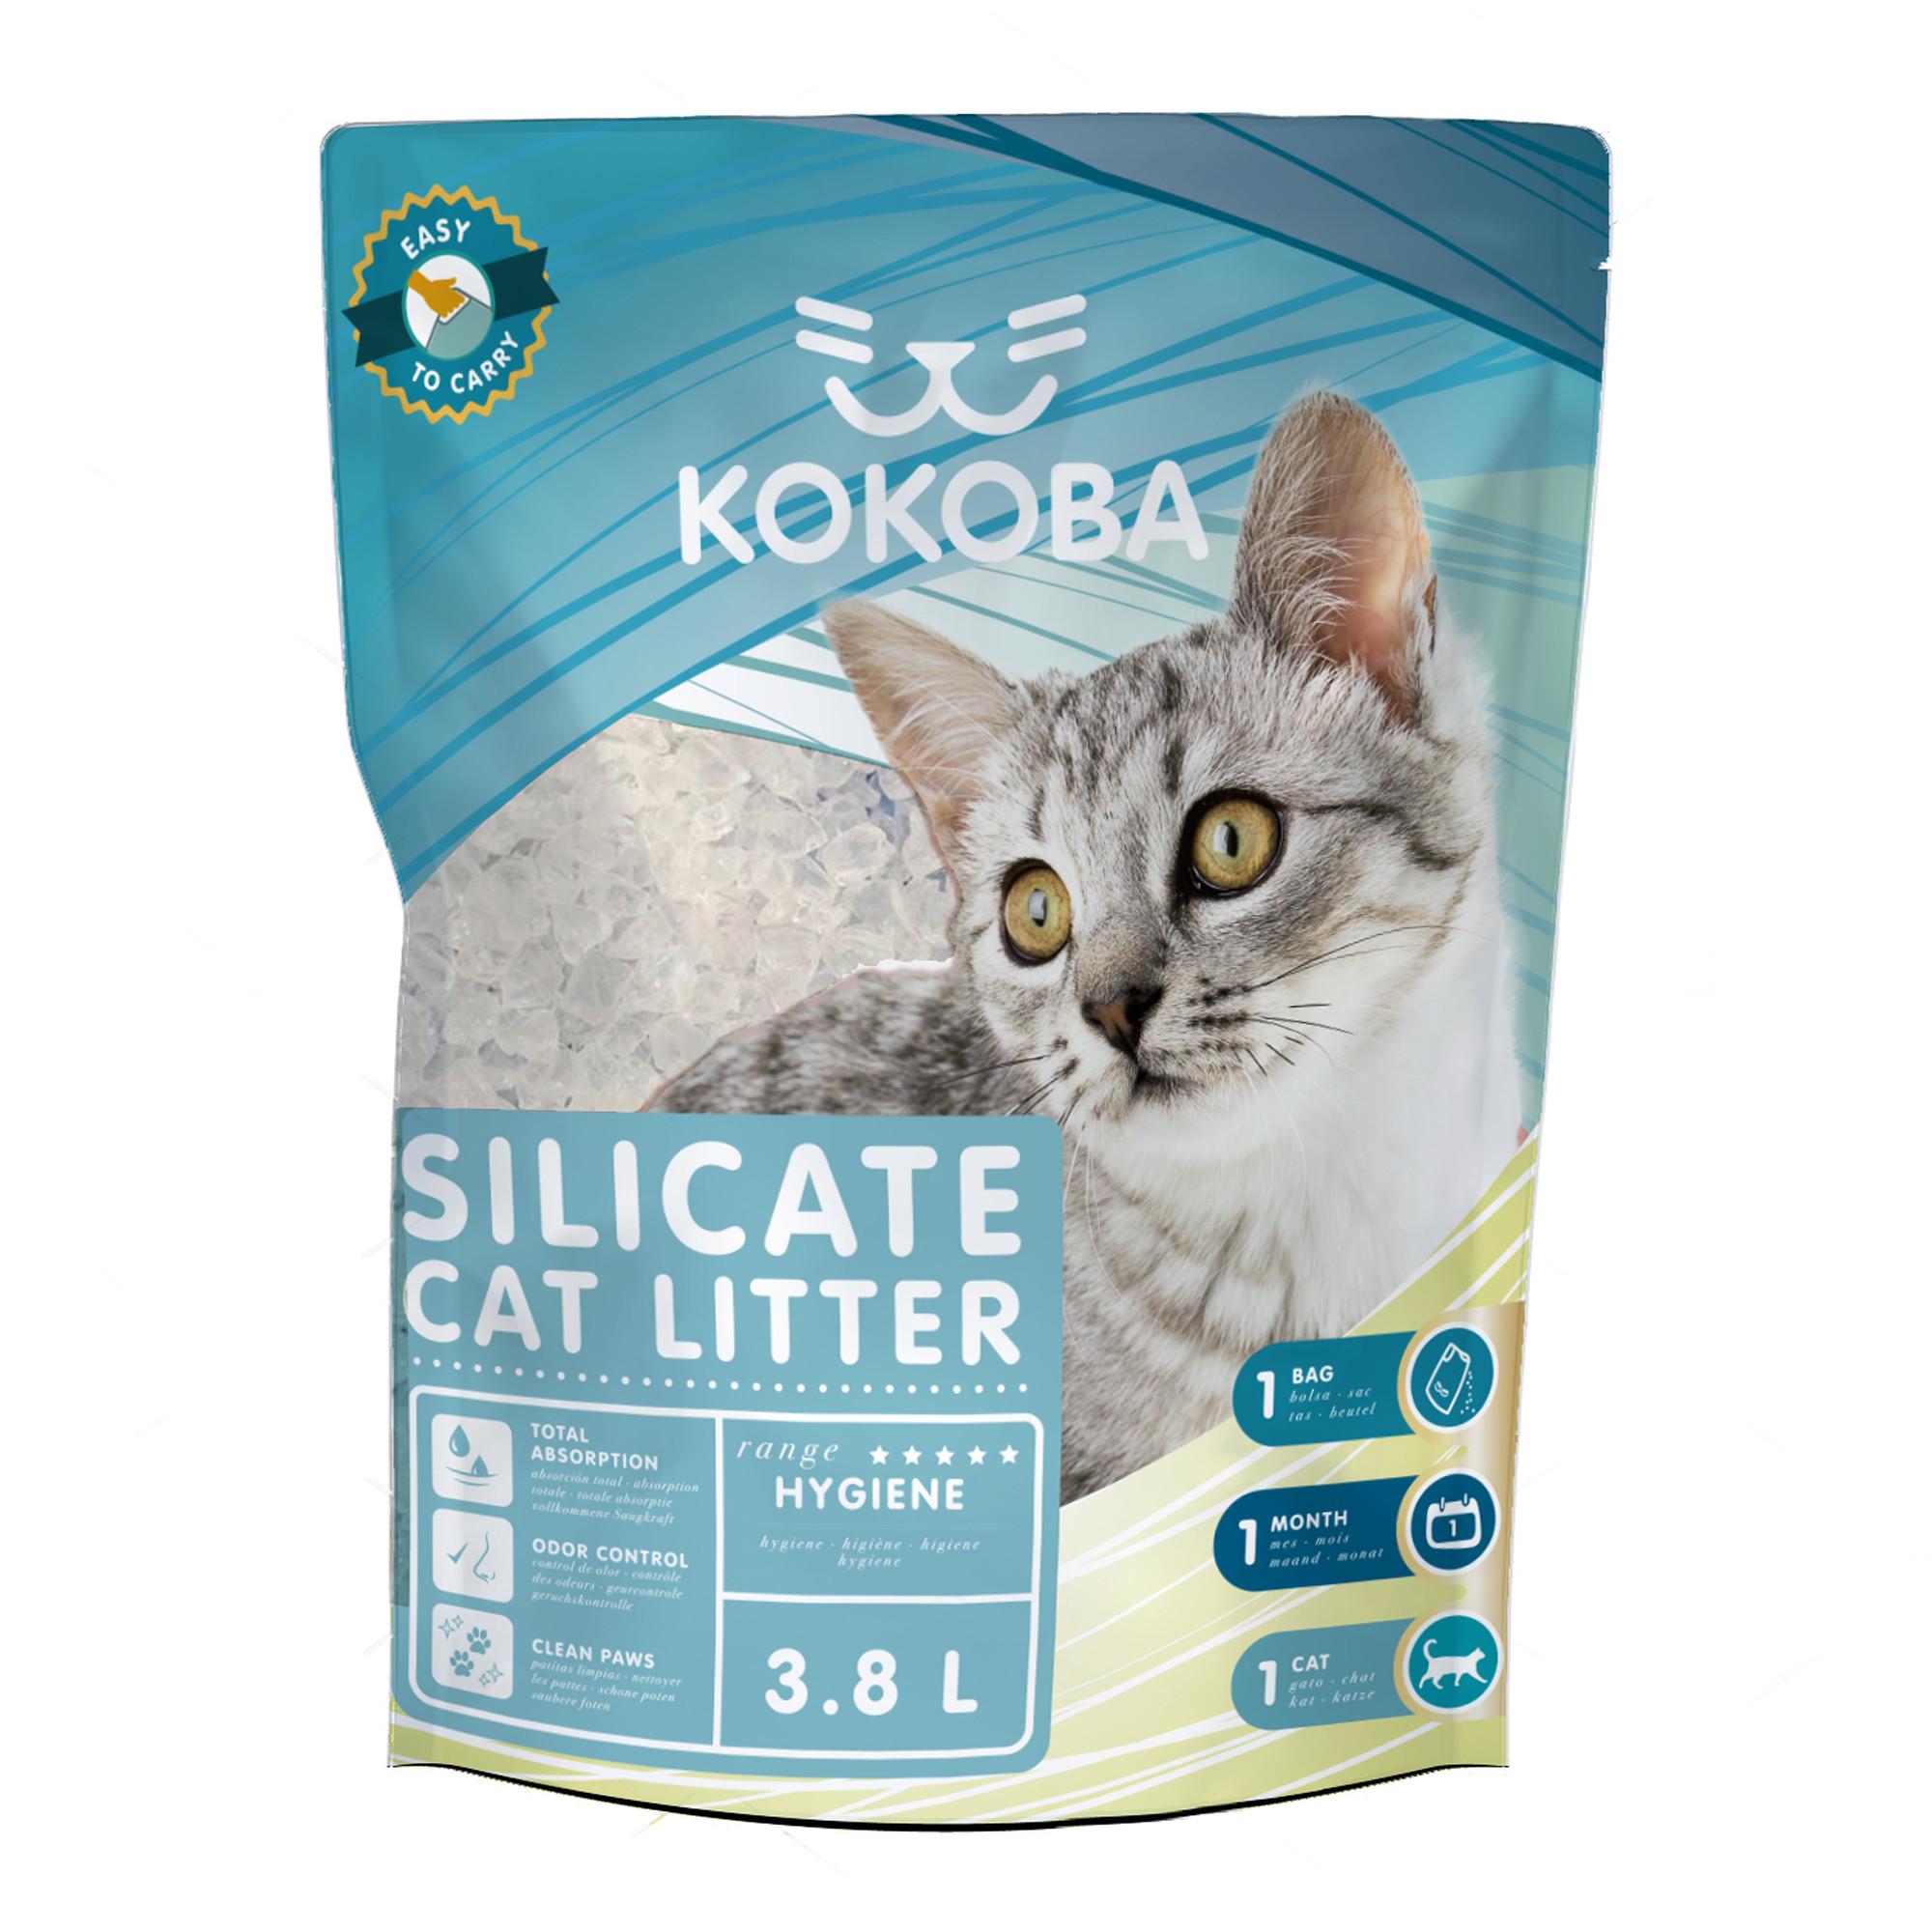 Kokoba Cat Litter